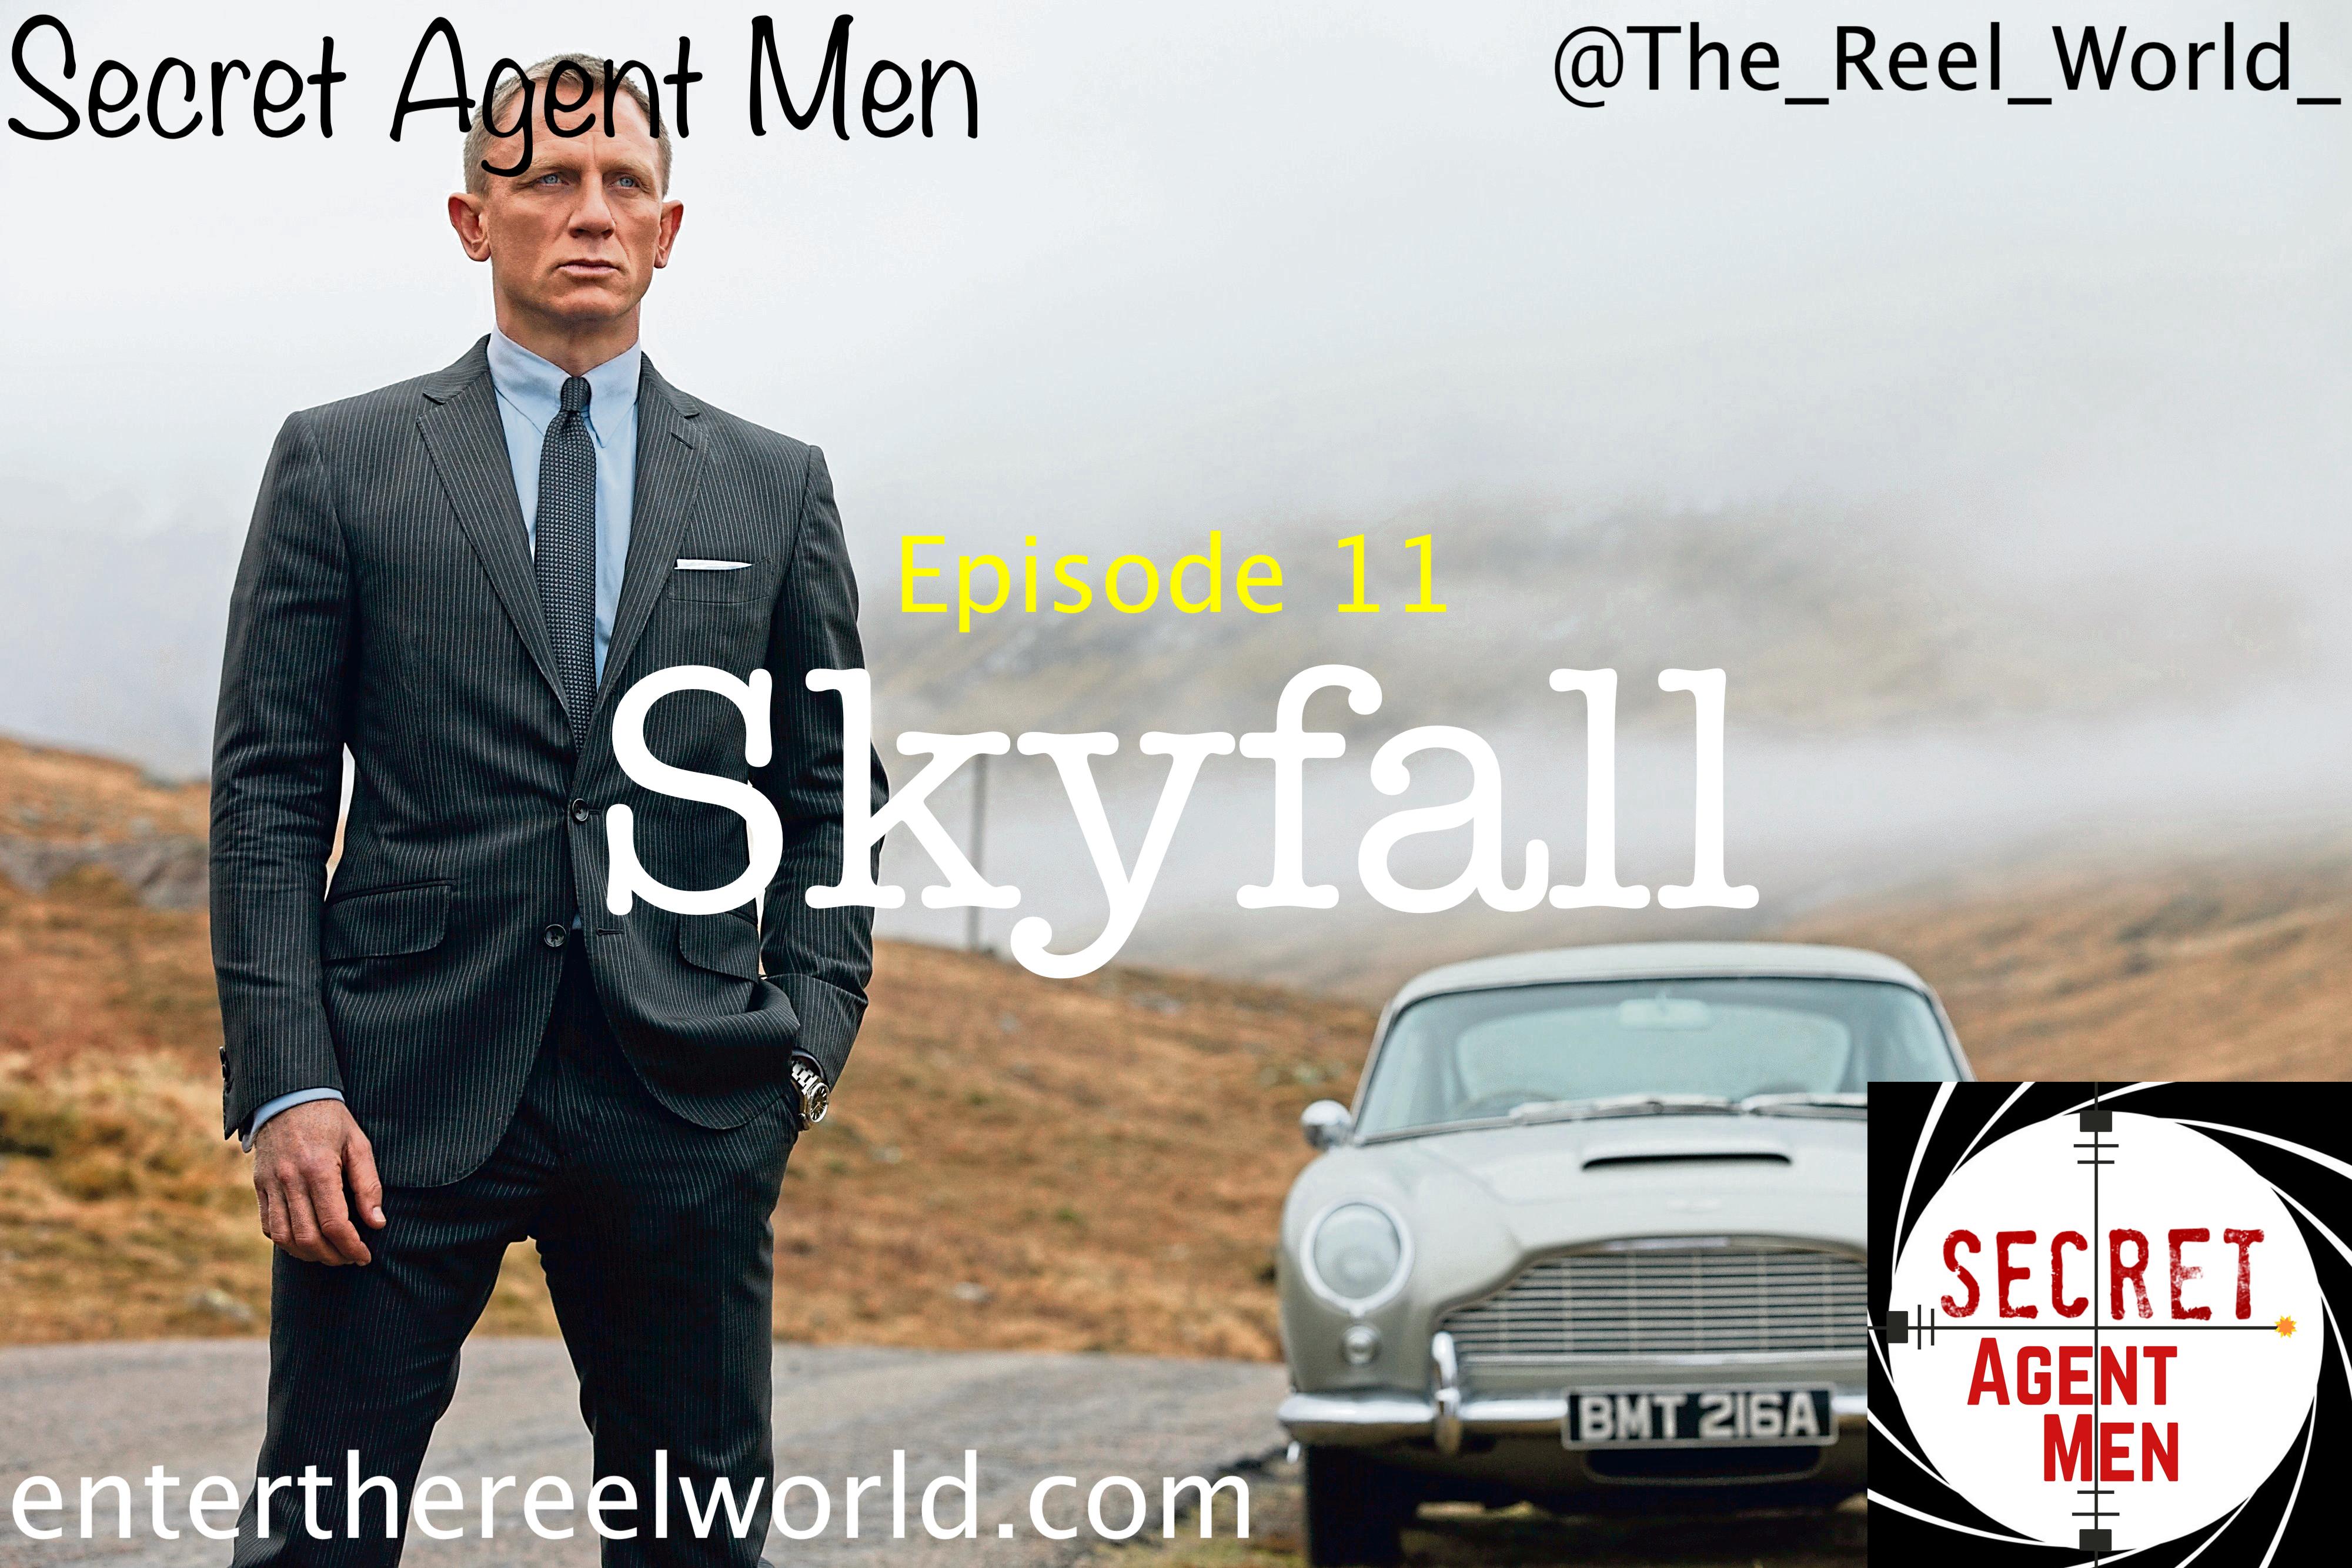 Skyfall is biggest earning film in UK